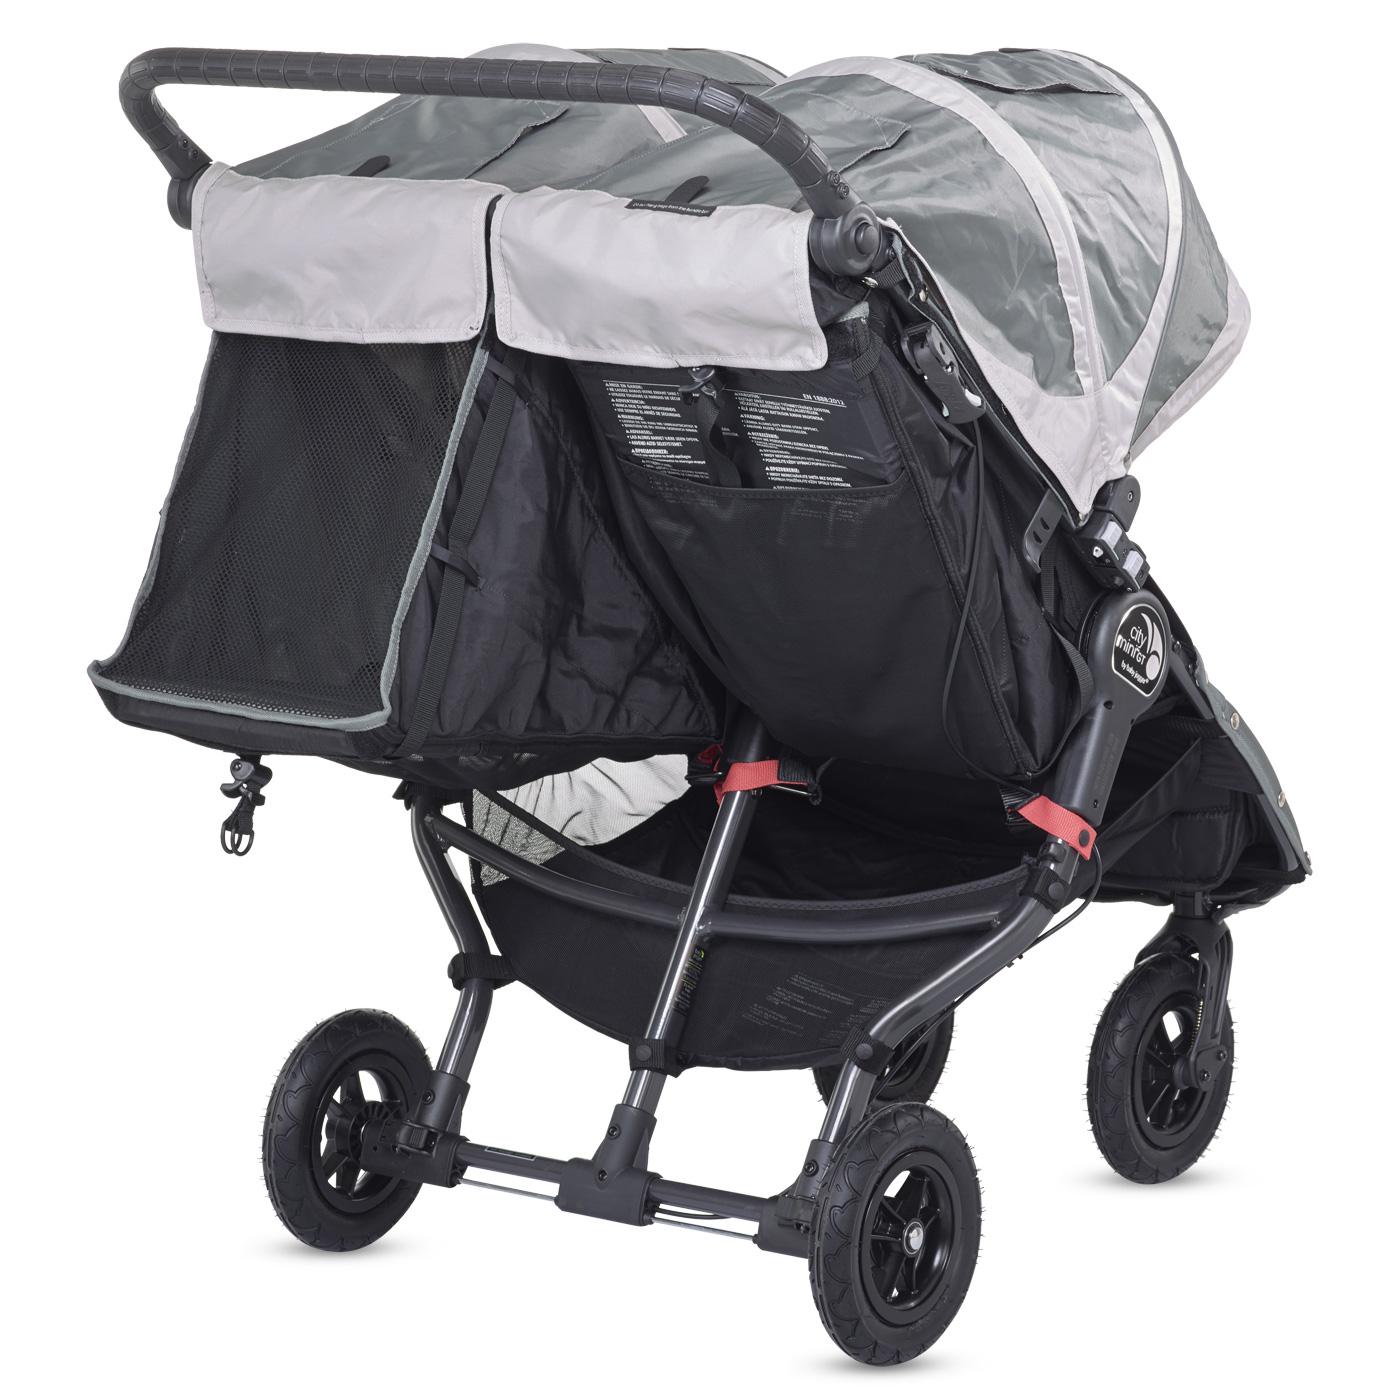 Baby Jogger City Mini Double GT / Schienale reclinabile